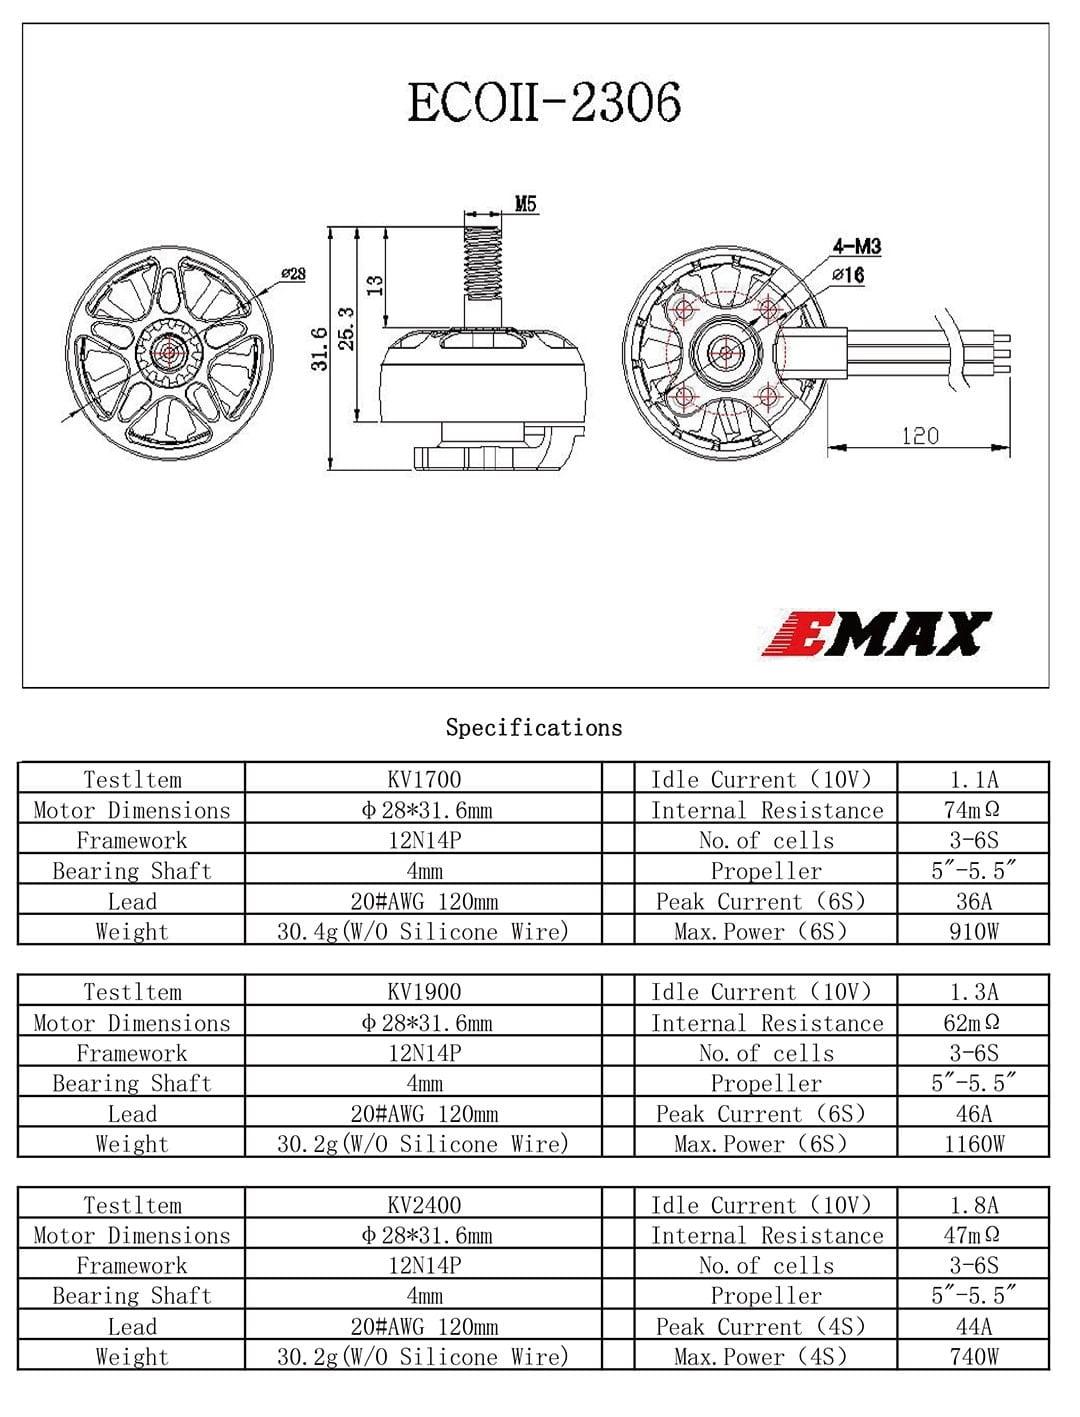 emax eco ii series 2306 1700 1900 2400kv brushless motor specifications mantisfpv